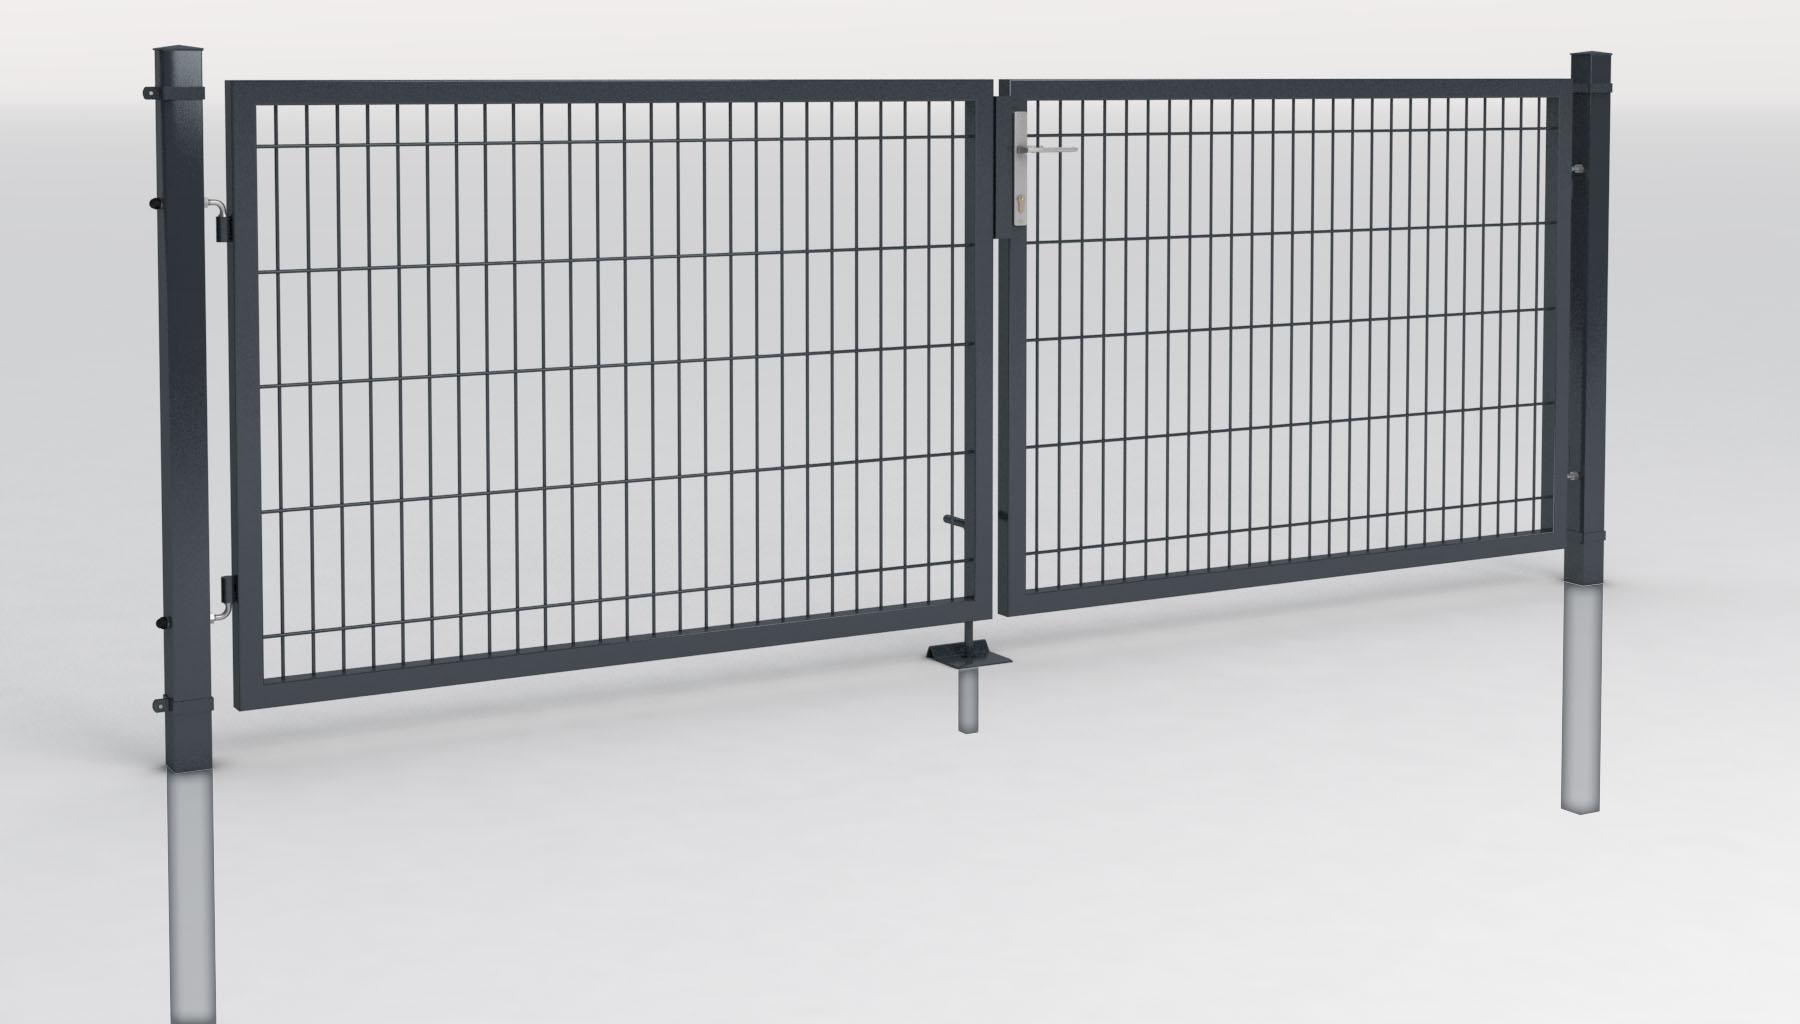 2 fl gel einfahrstor toranlage gartentor tore ca 3m zauntor rahmentor gittertor ebay. Black Bedroom Furniture Sets. Home Design Ideas